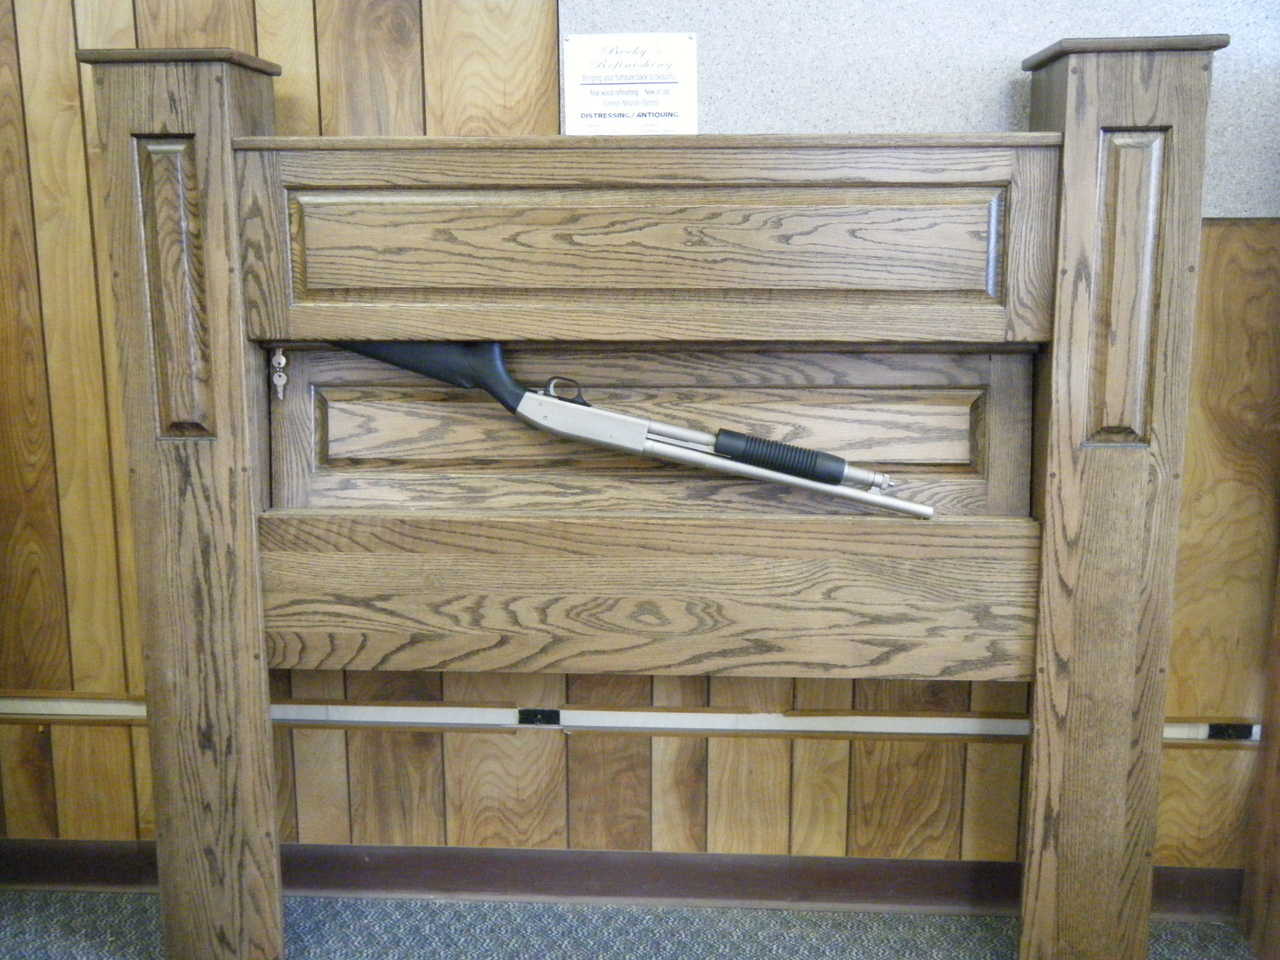 sofa gun safe 1 seater set ikea flaxa headboard reviews  nazarm